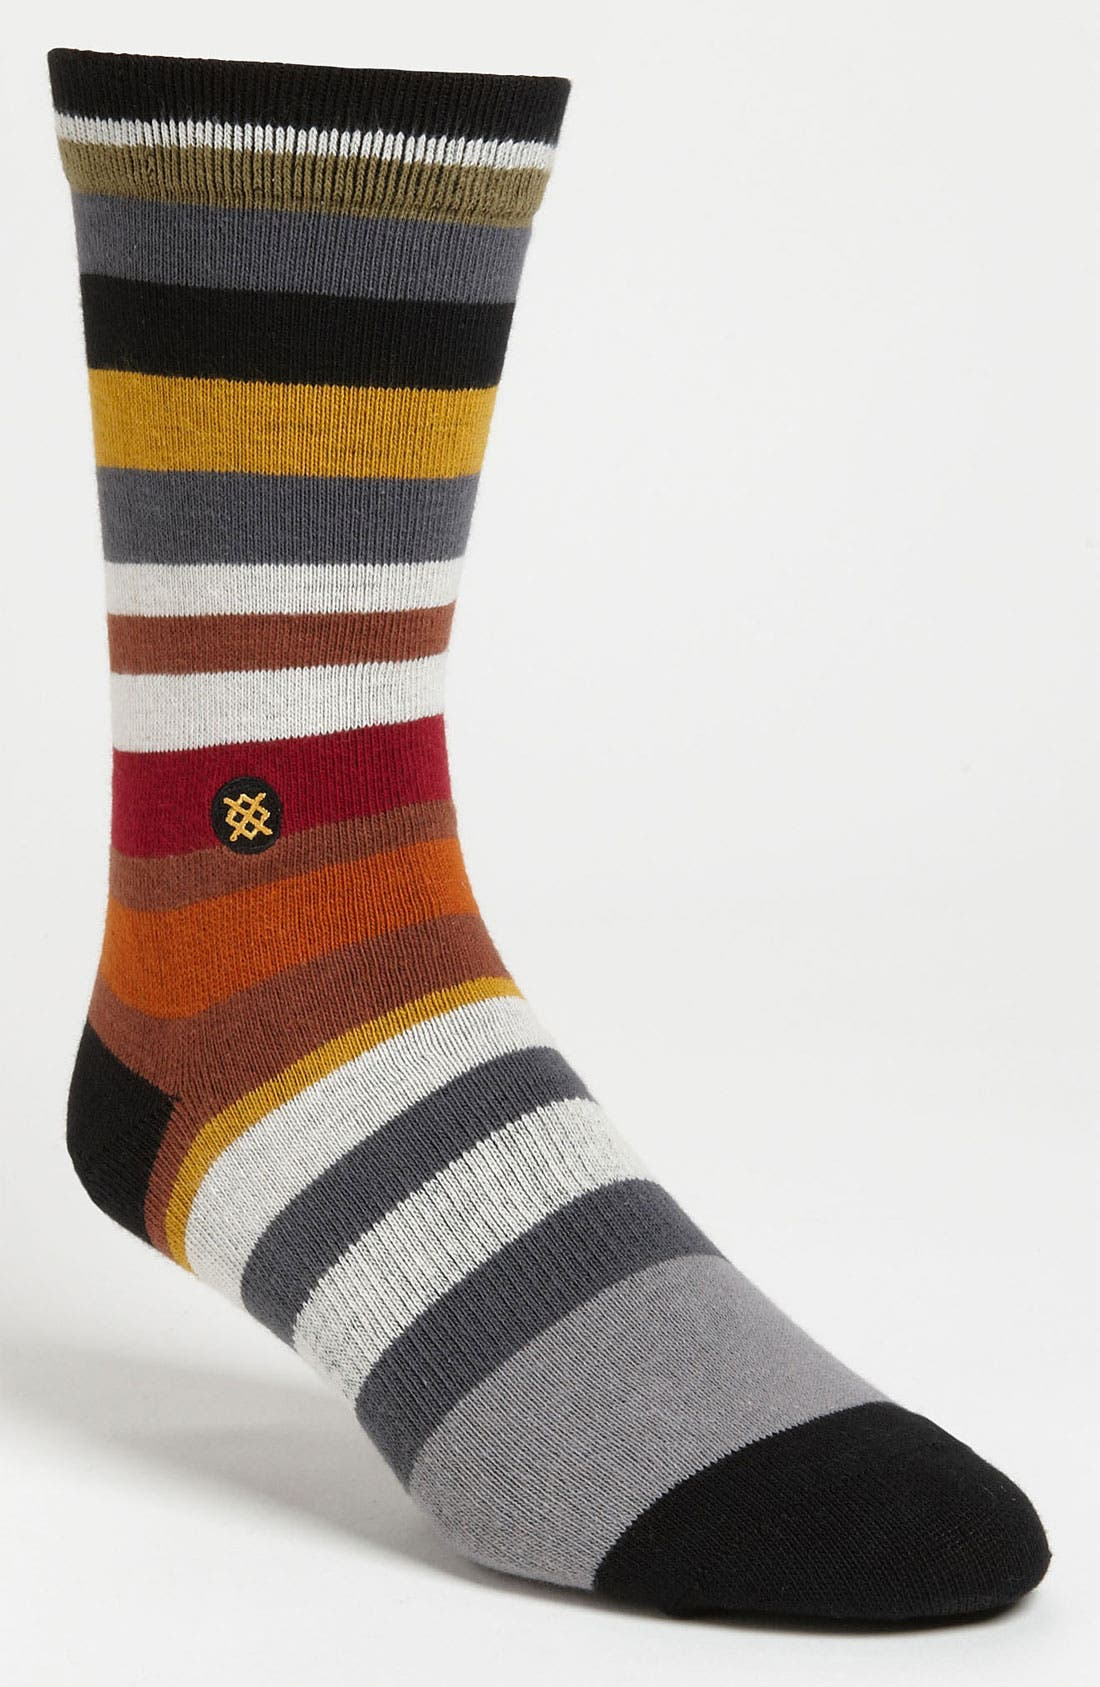 Alternate Image 1 Selected - Stance 'Cannon' Socks